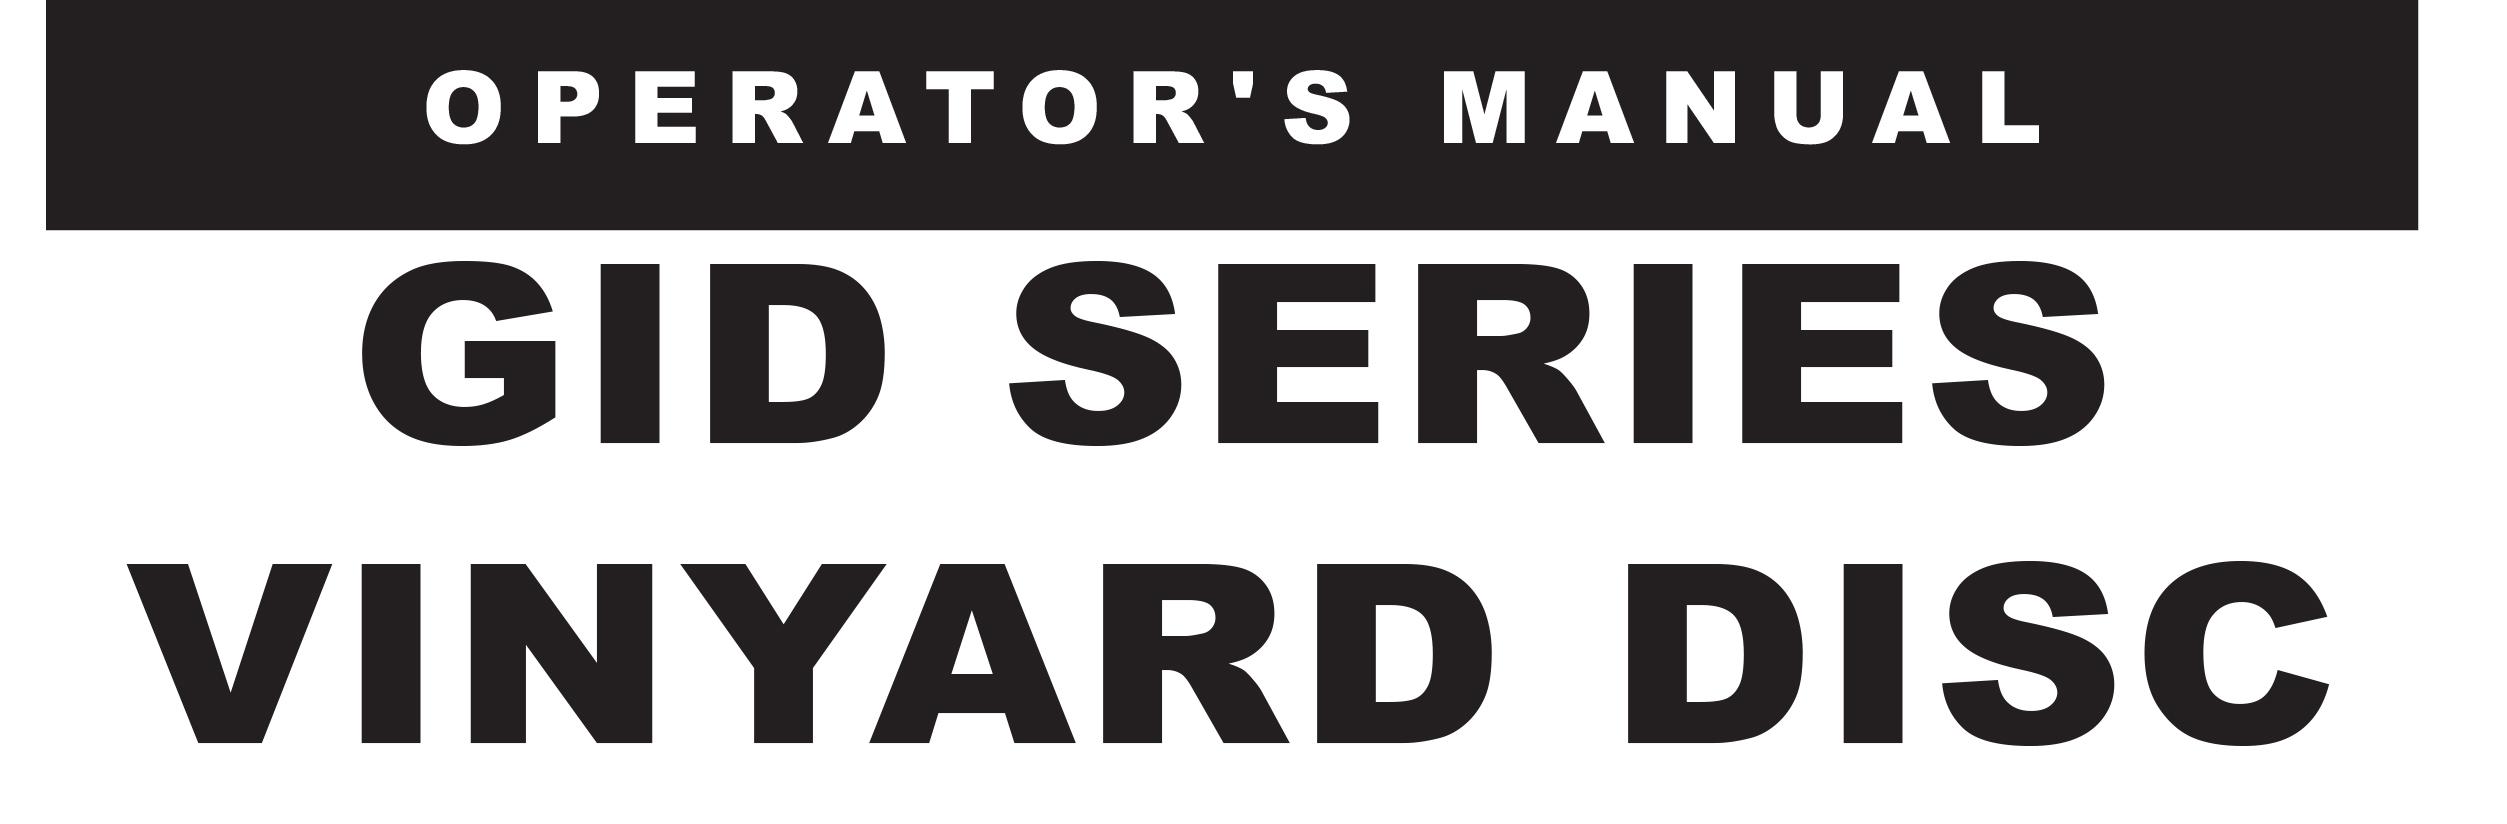 GID Series Owners Manual